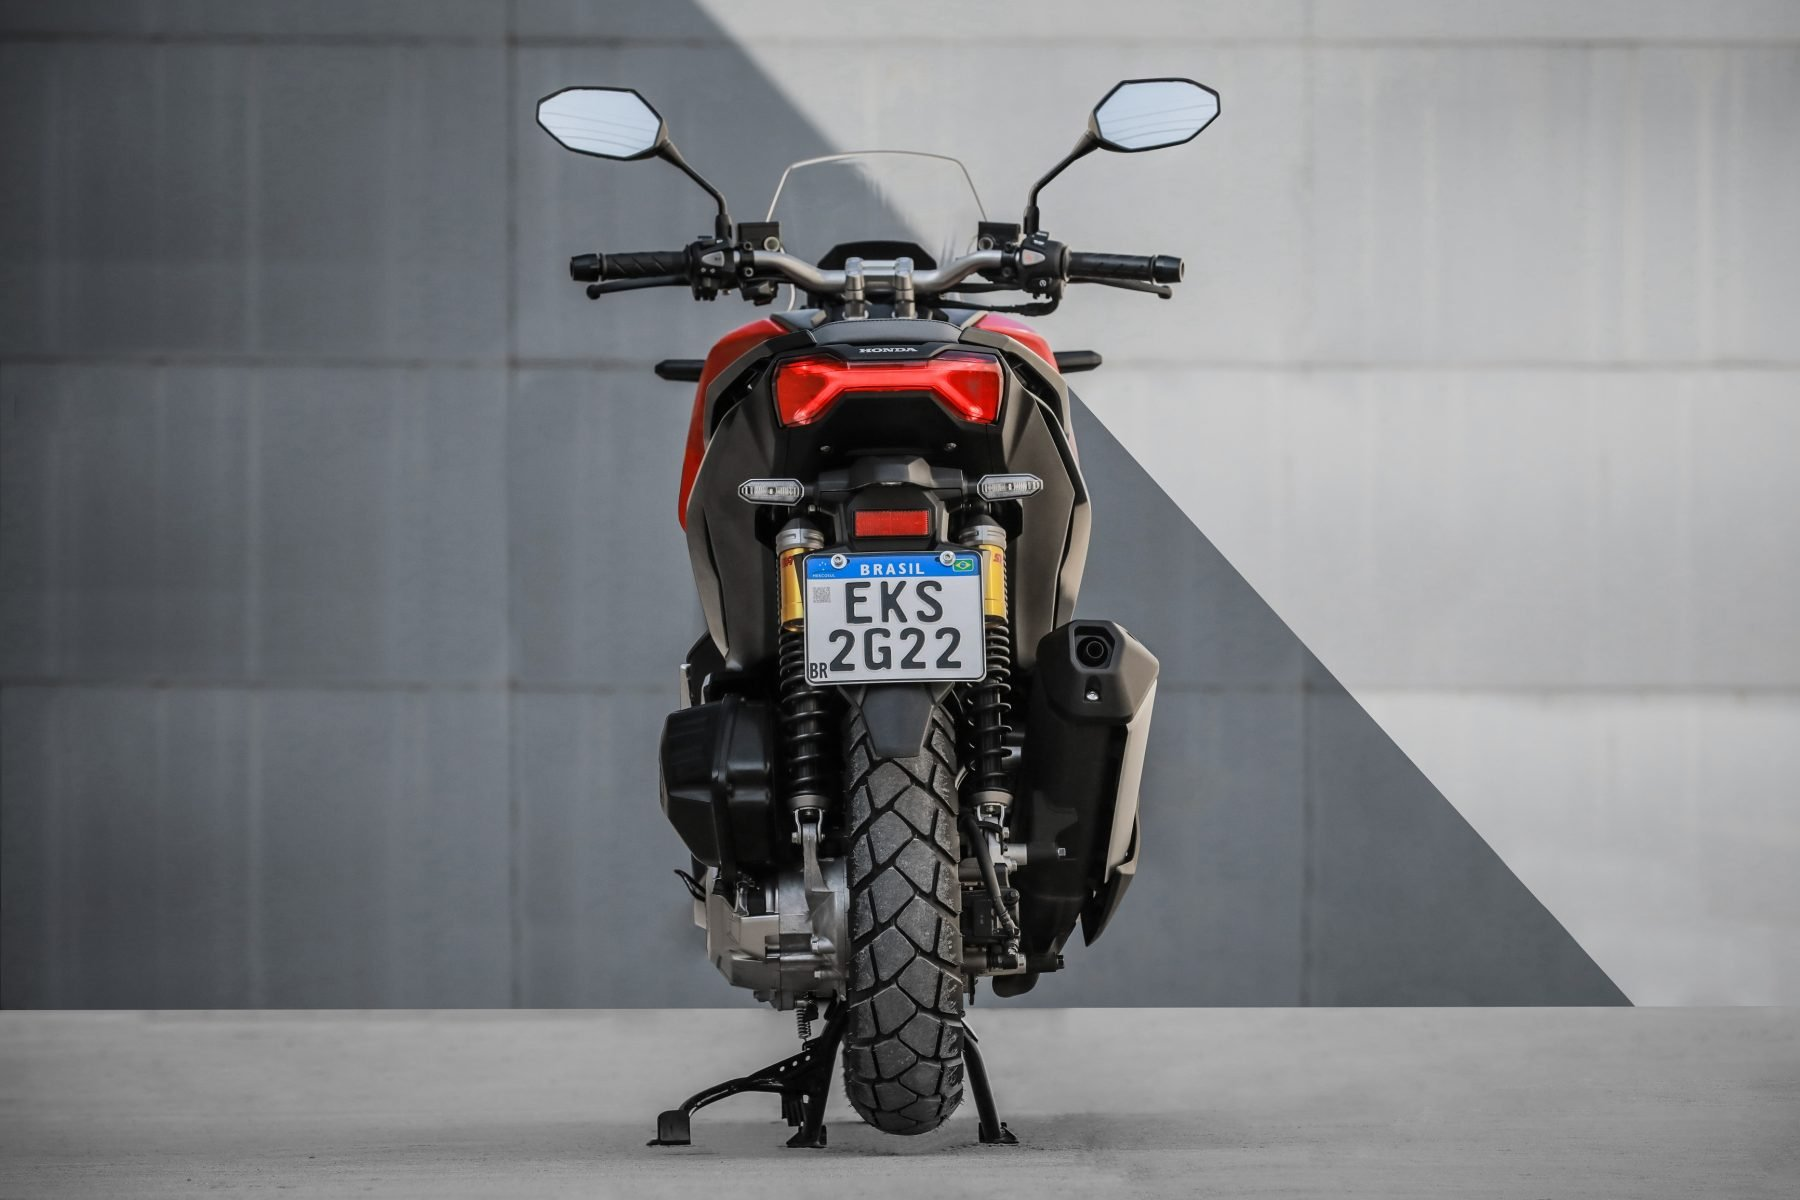 scooter honda adv 150 impressoes 9